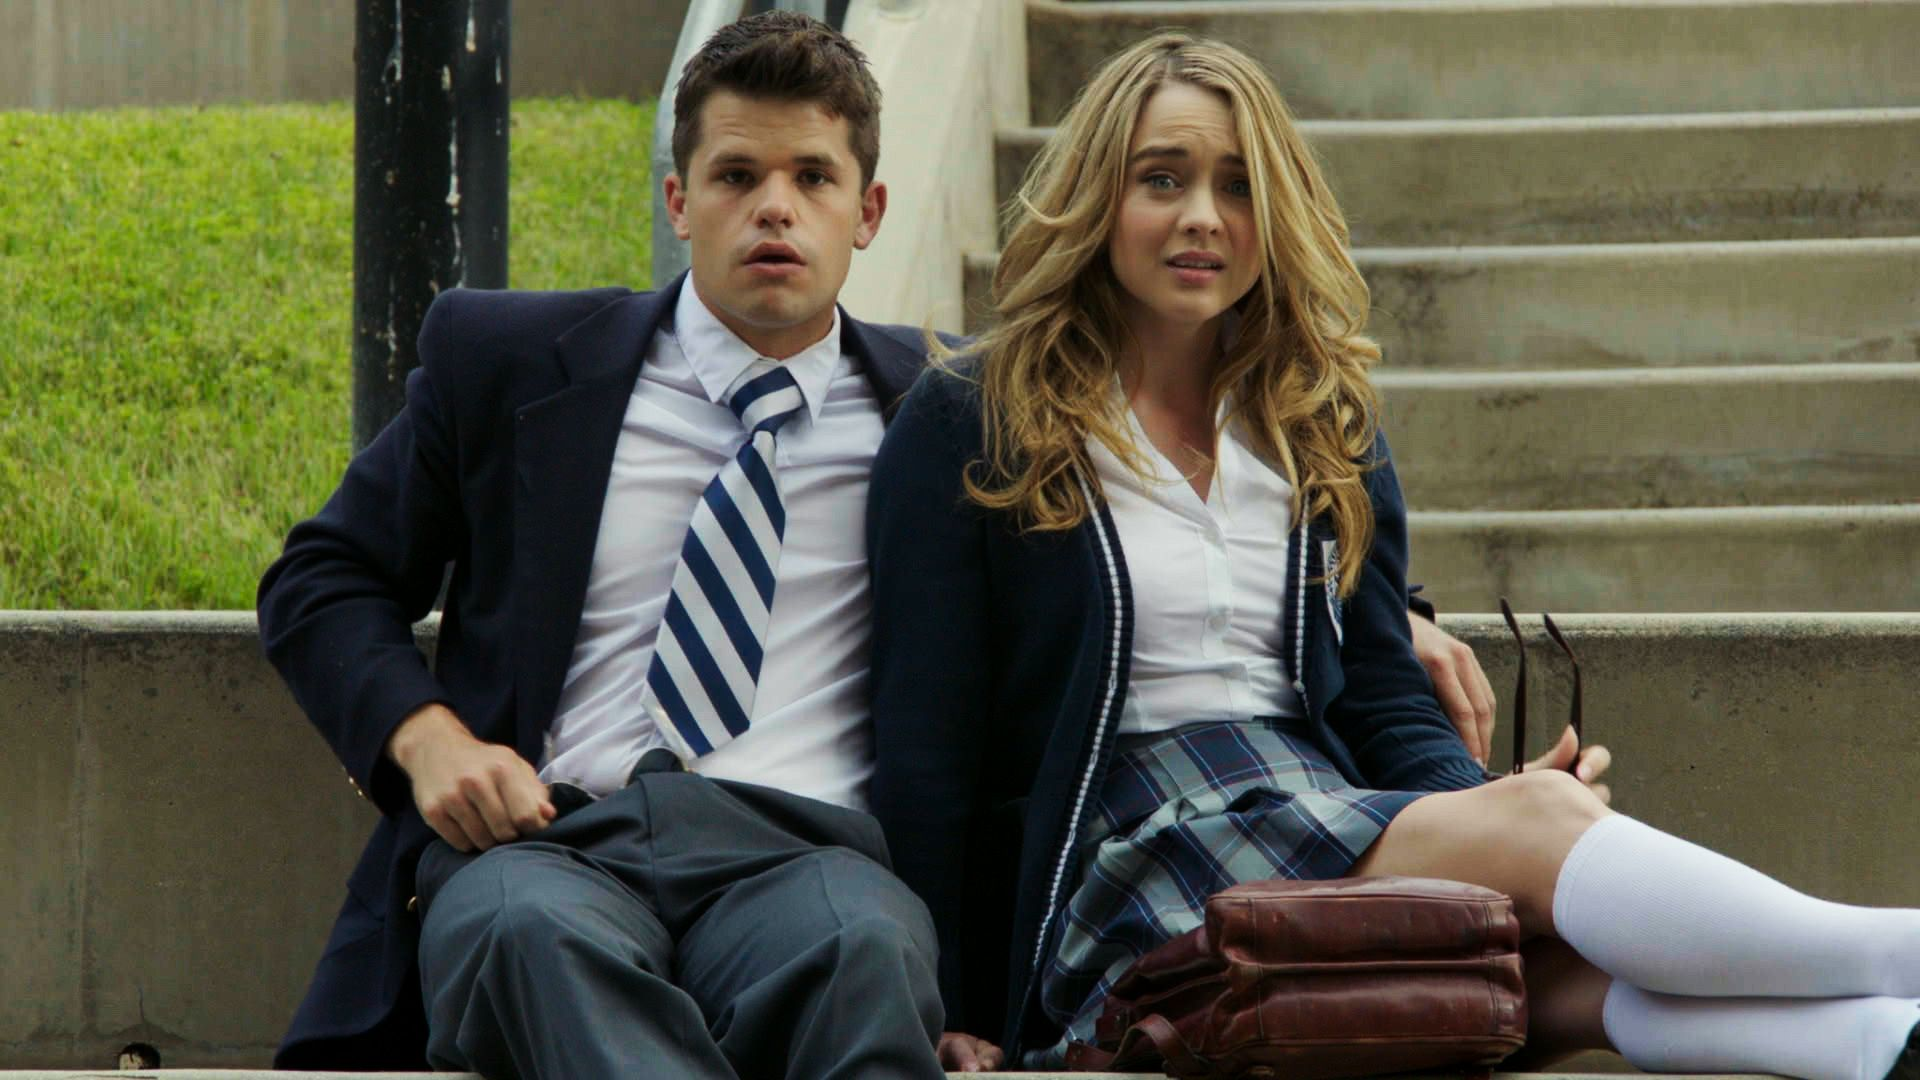 Season 01, Episode 01 The Return of the Prodigal Teens